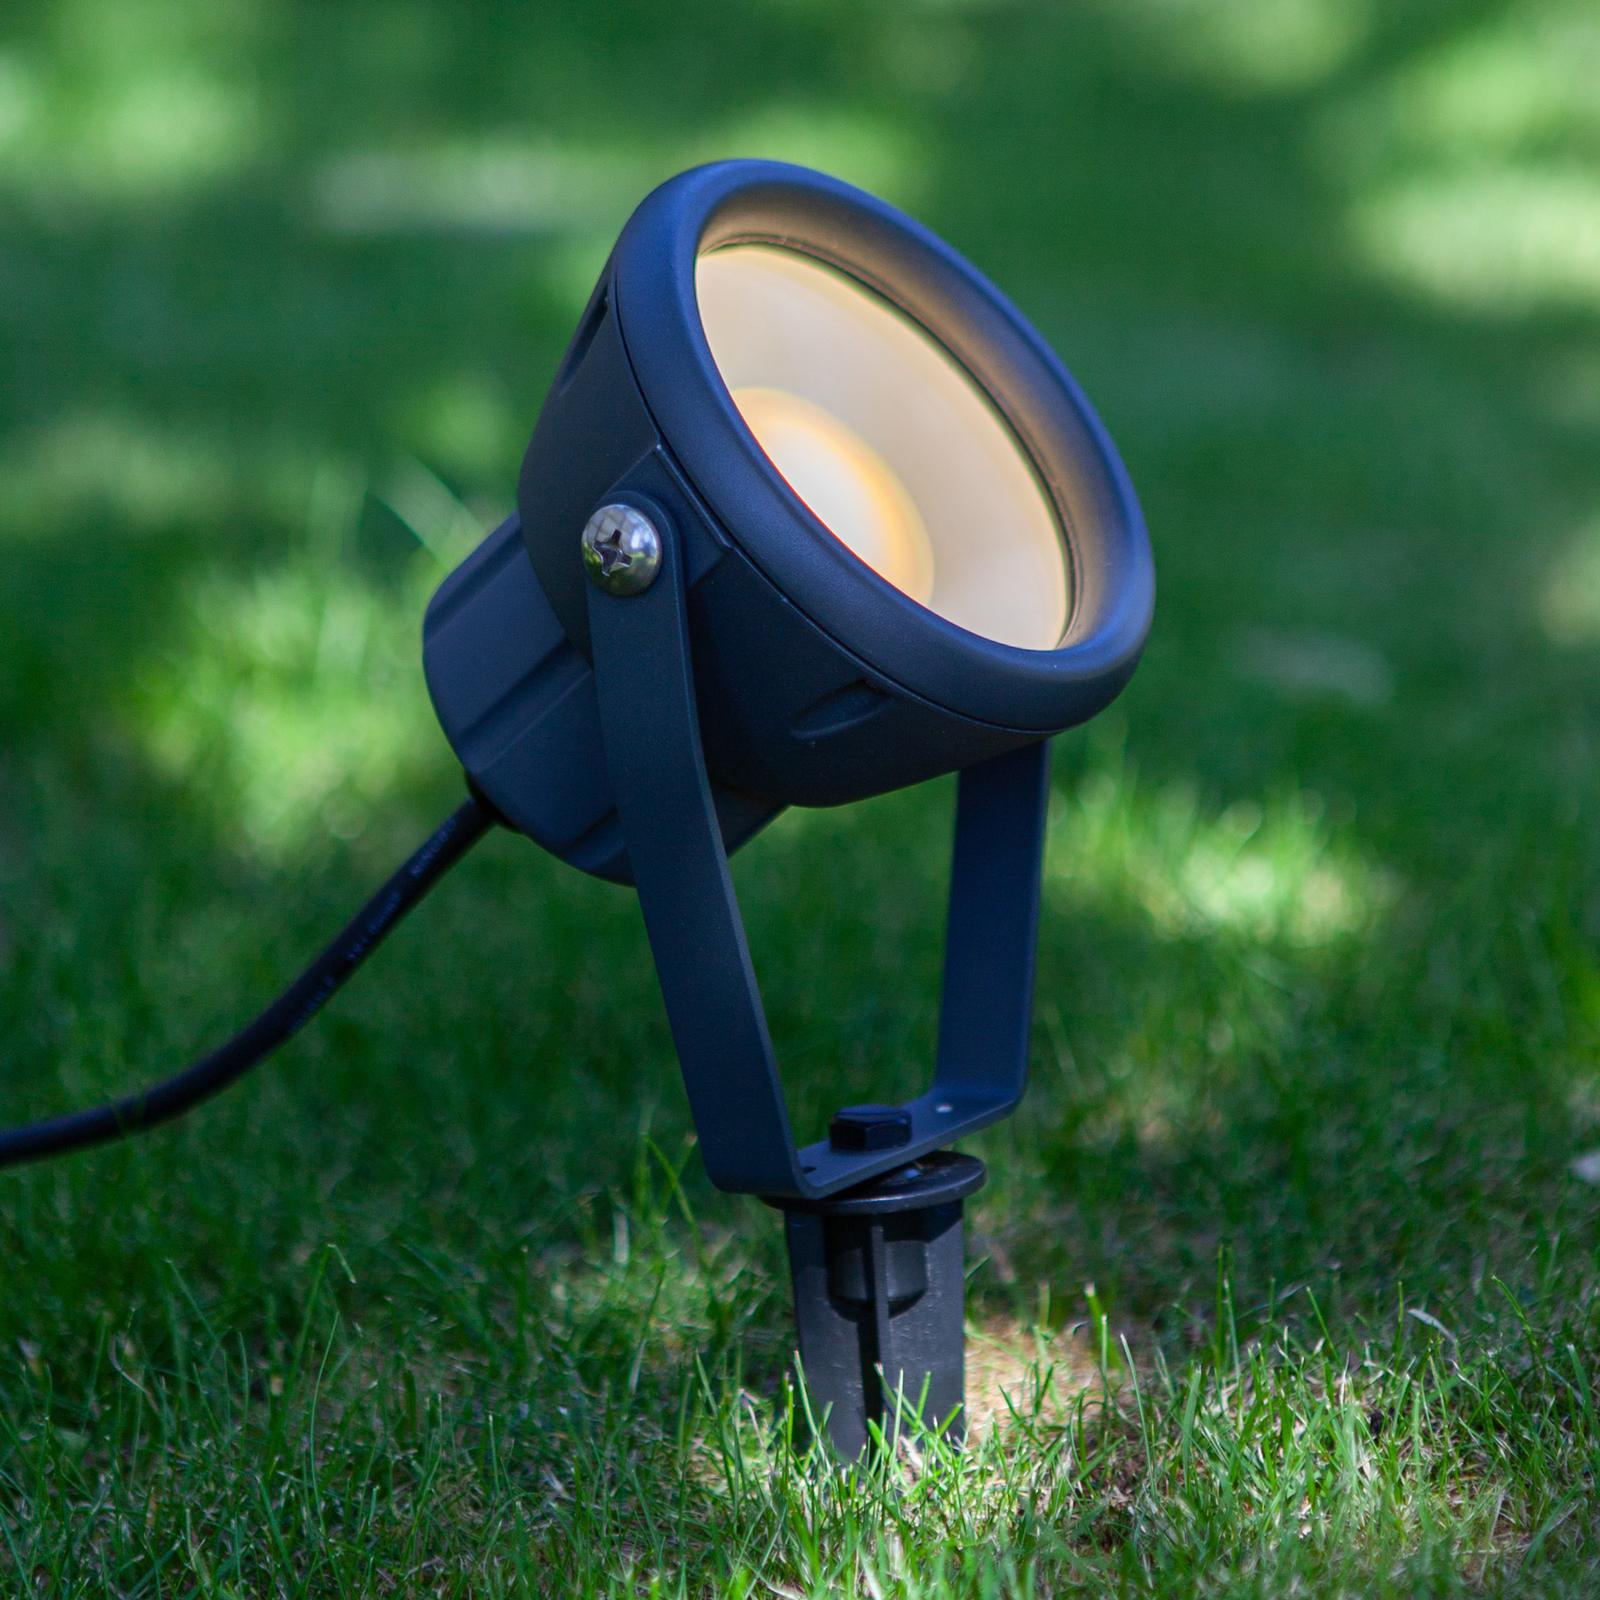 Mini Leto LED-jordspyd, RGBW smart kontrollerbar